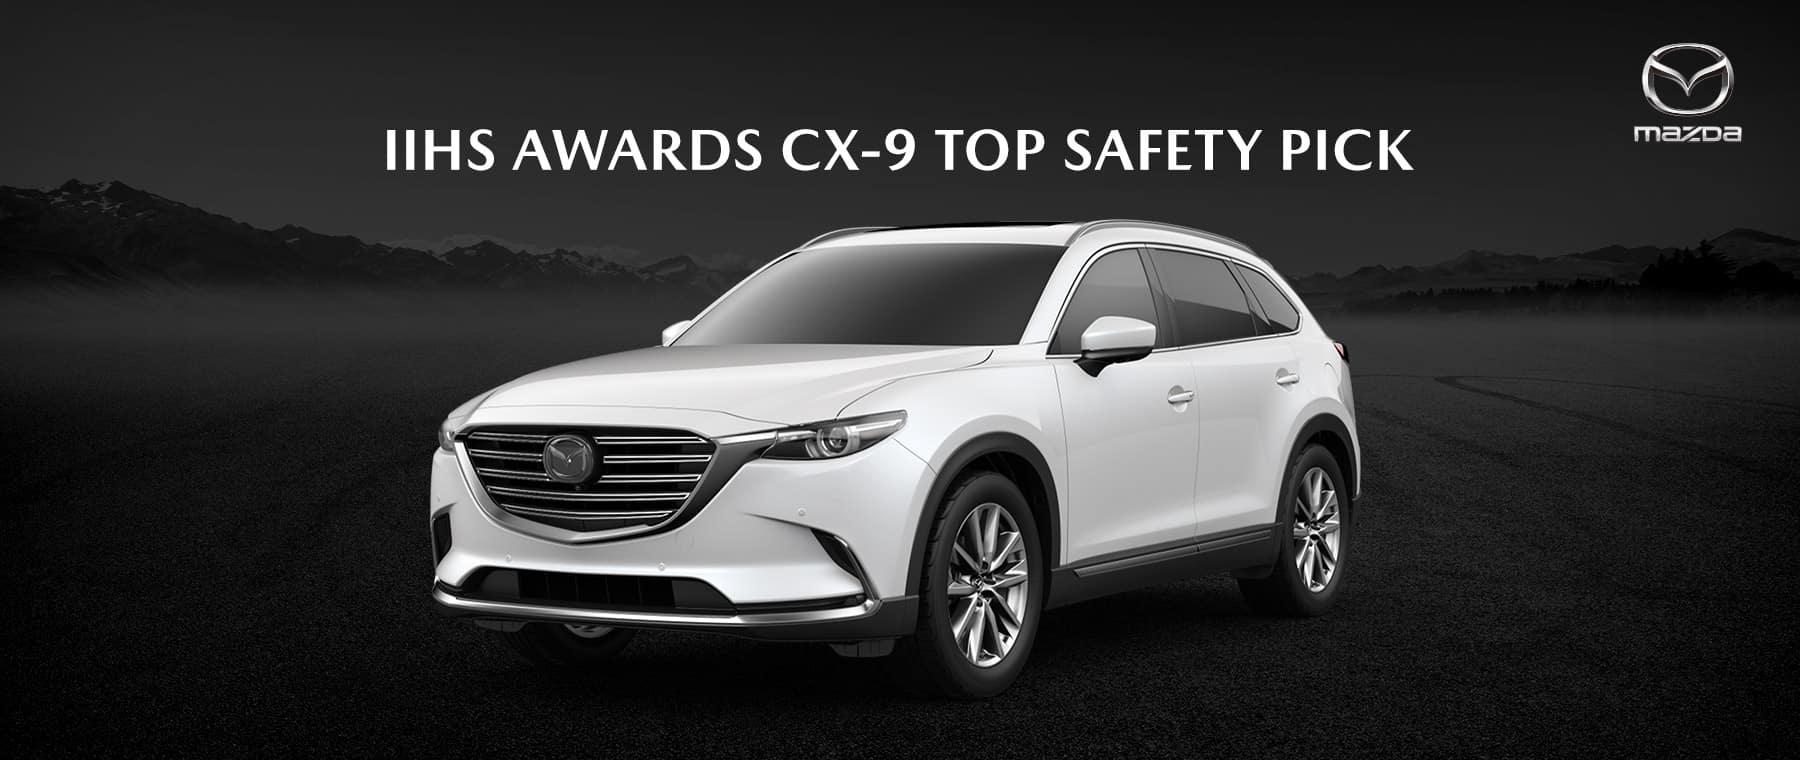 2020 Mazda CX-9 Wins Top Safety Pick+ Award - Bert Ogden Mission Mazda - Mission, TX